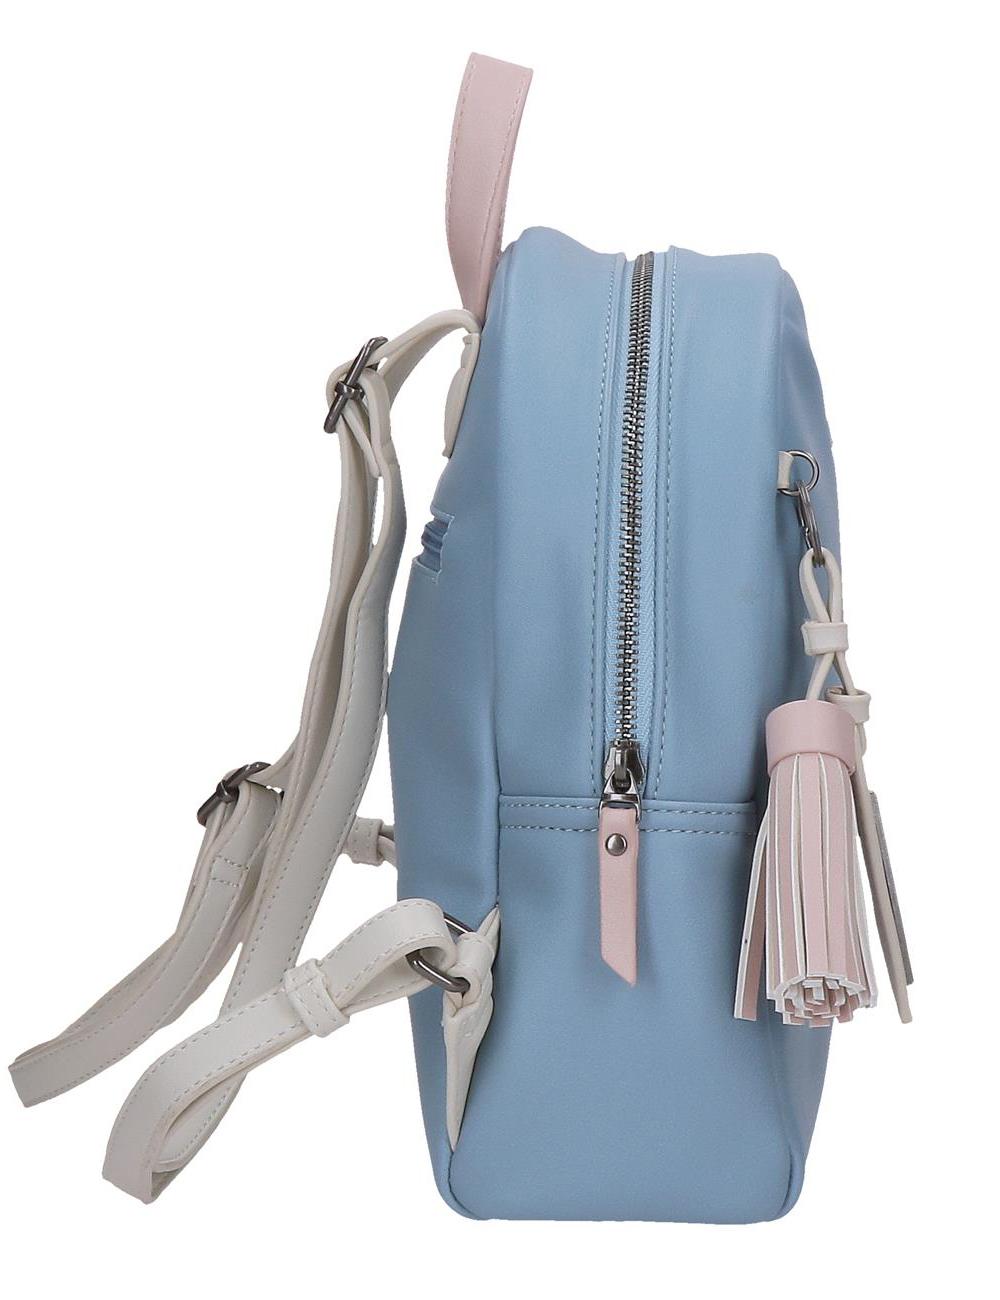 7582122 Mochila 28cm Pepe Jeans Zaida Azul